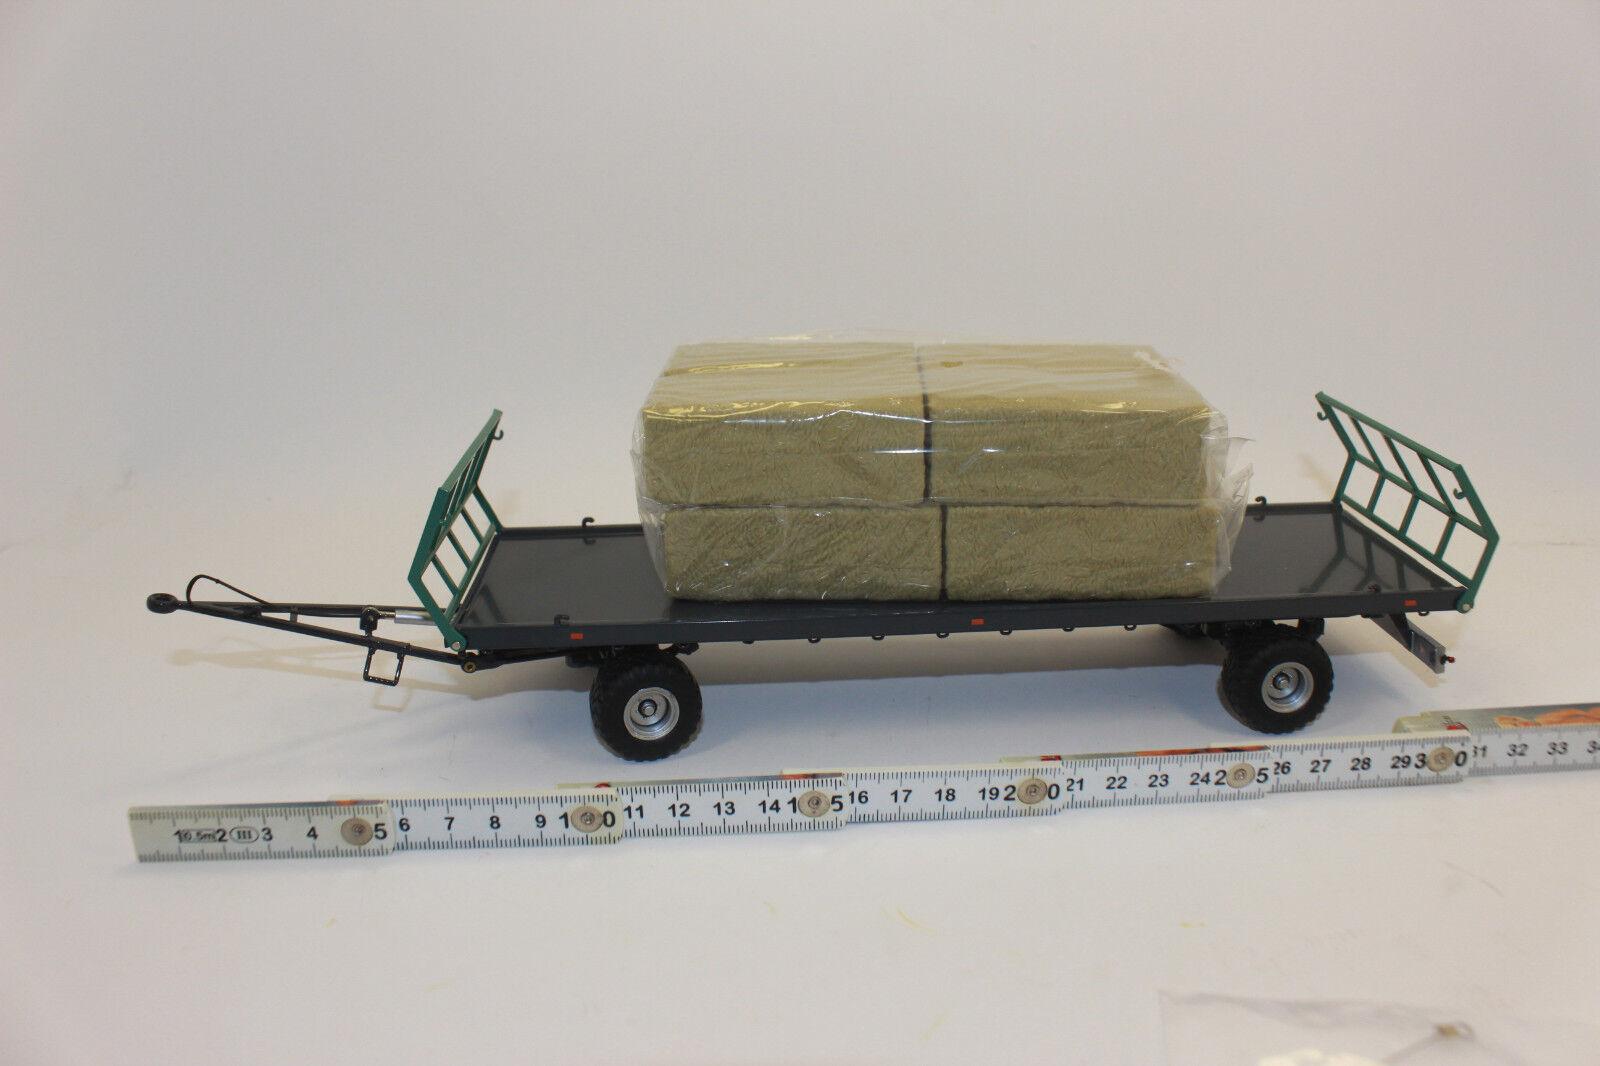 Wiking Wiking Wiking 077831 Oehler ZweiachsBale wagon transport ZDK 120 B 1:32 | élégante  eb9002